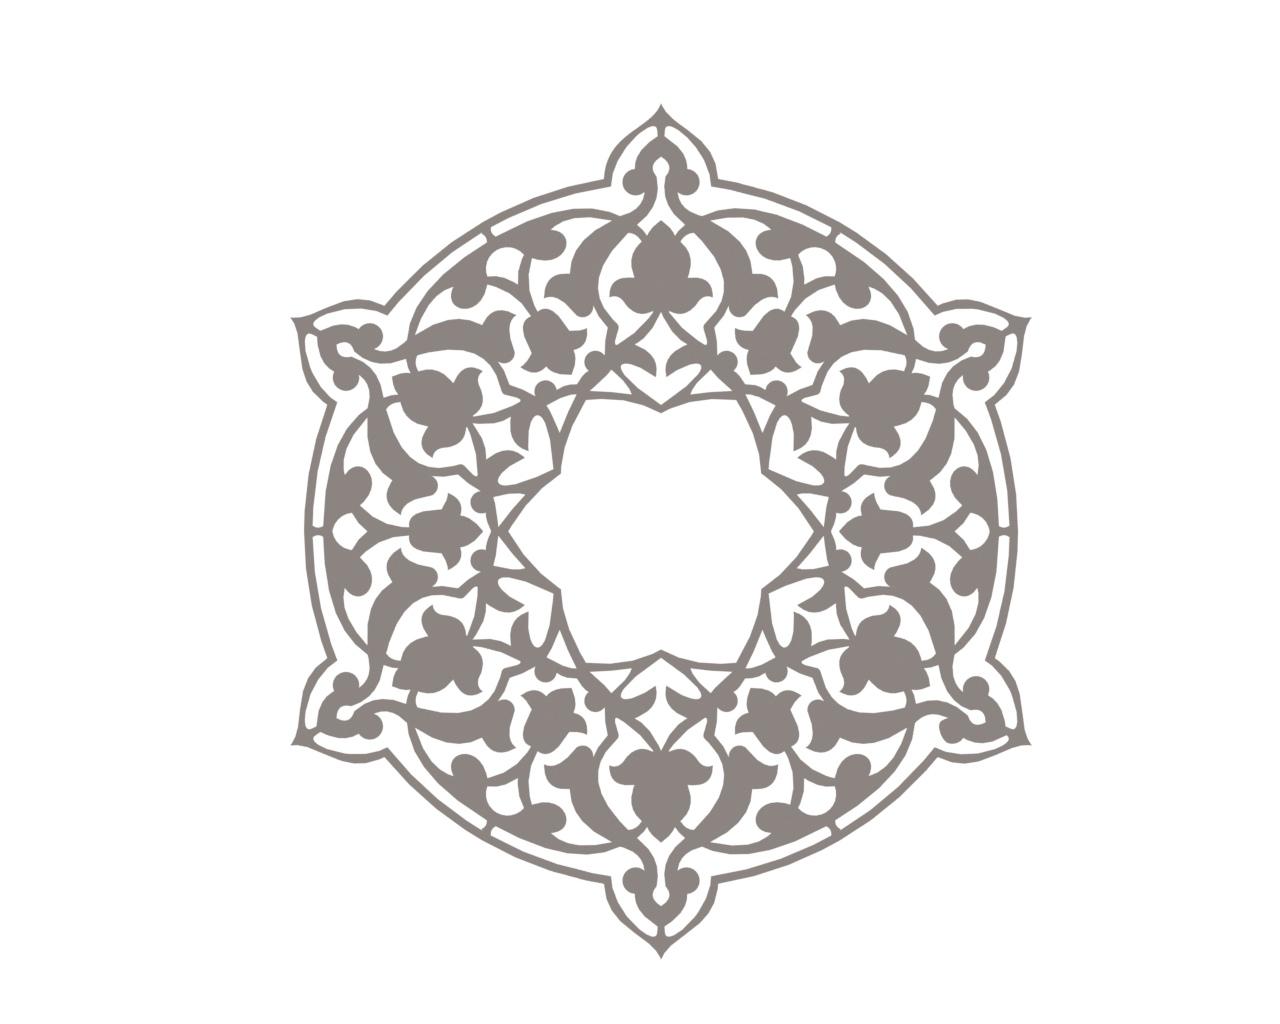 Awesome Mandala Ornament Free DXF File